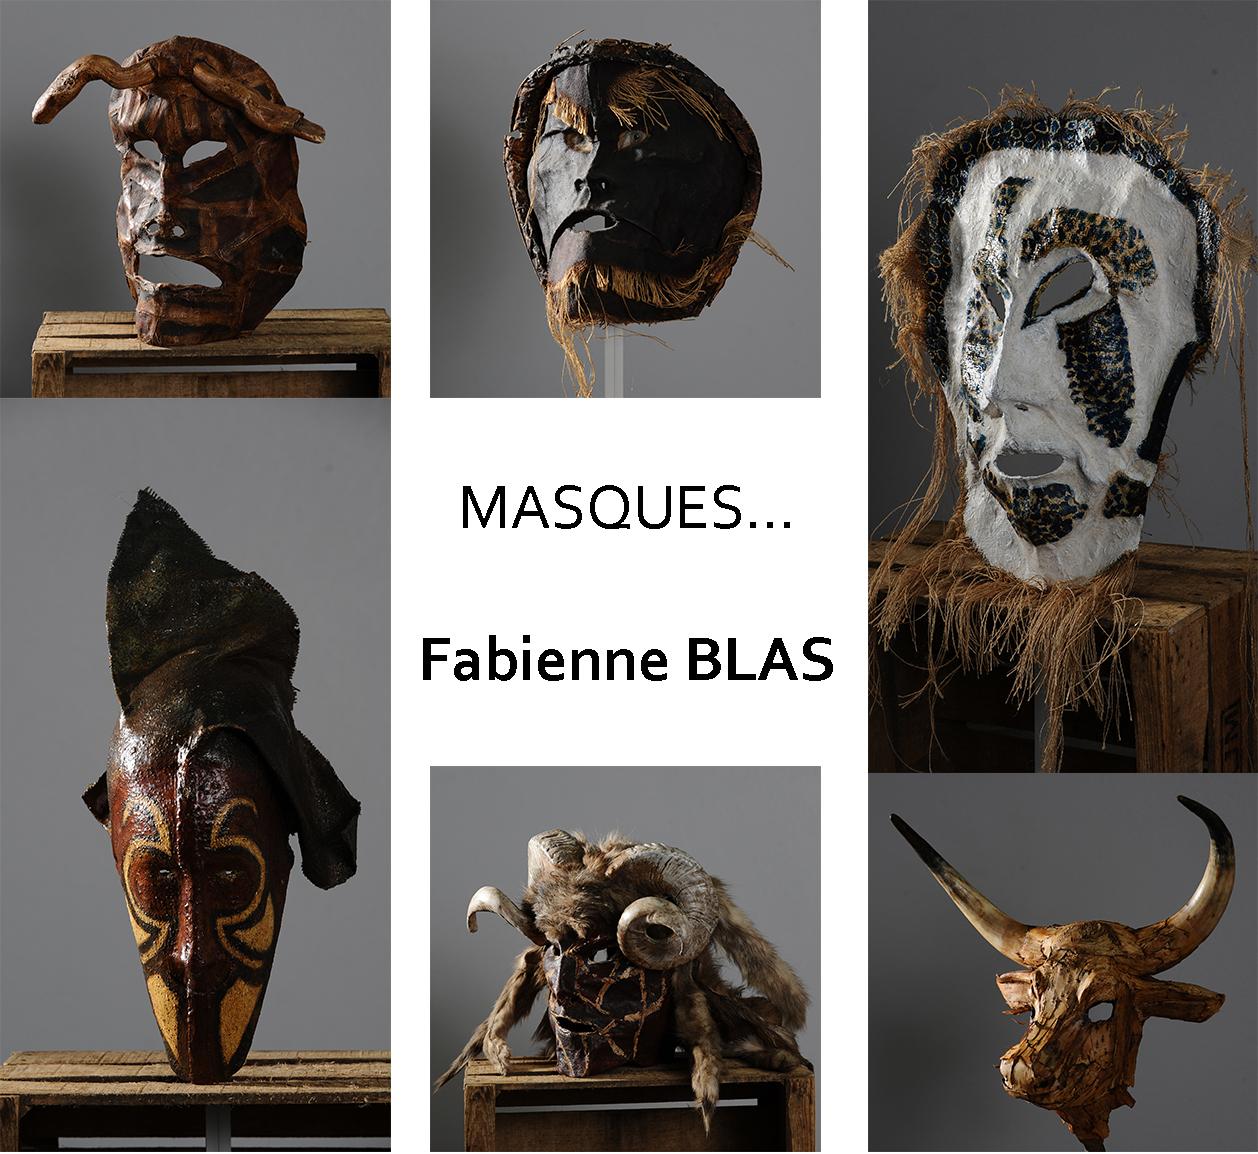 Masques... Fabienne Blas